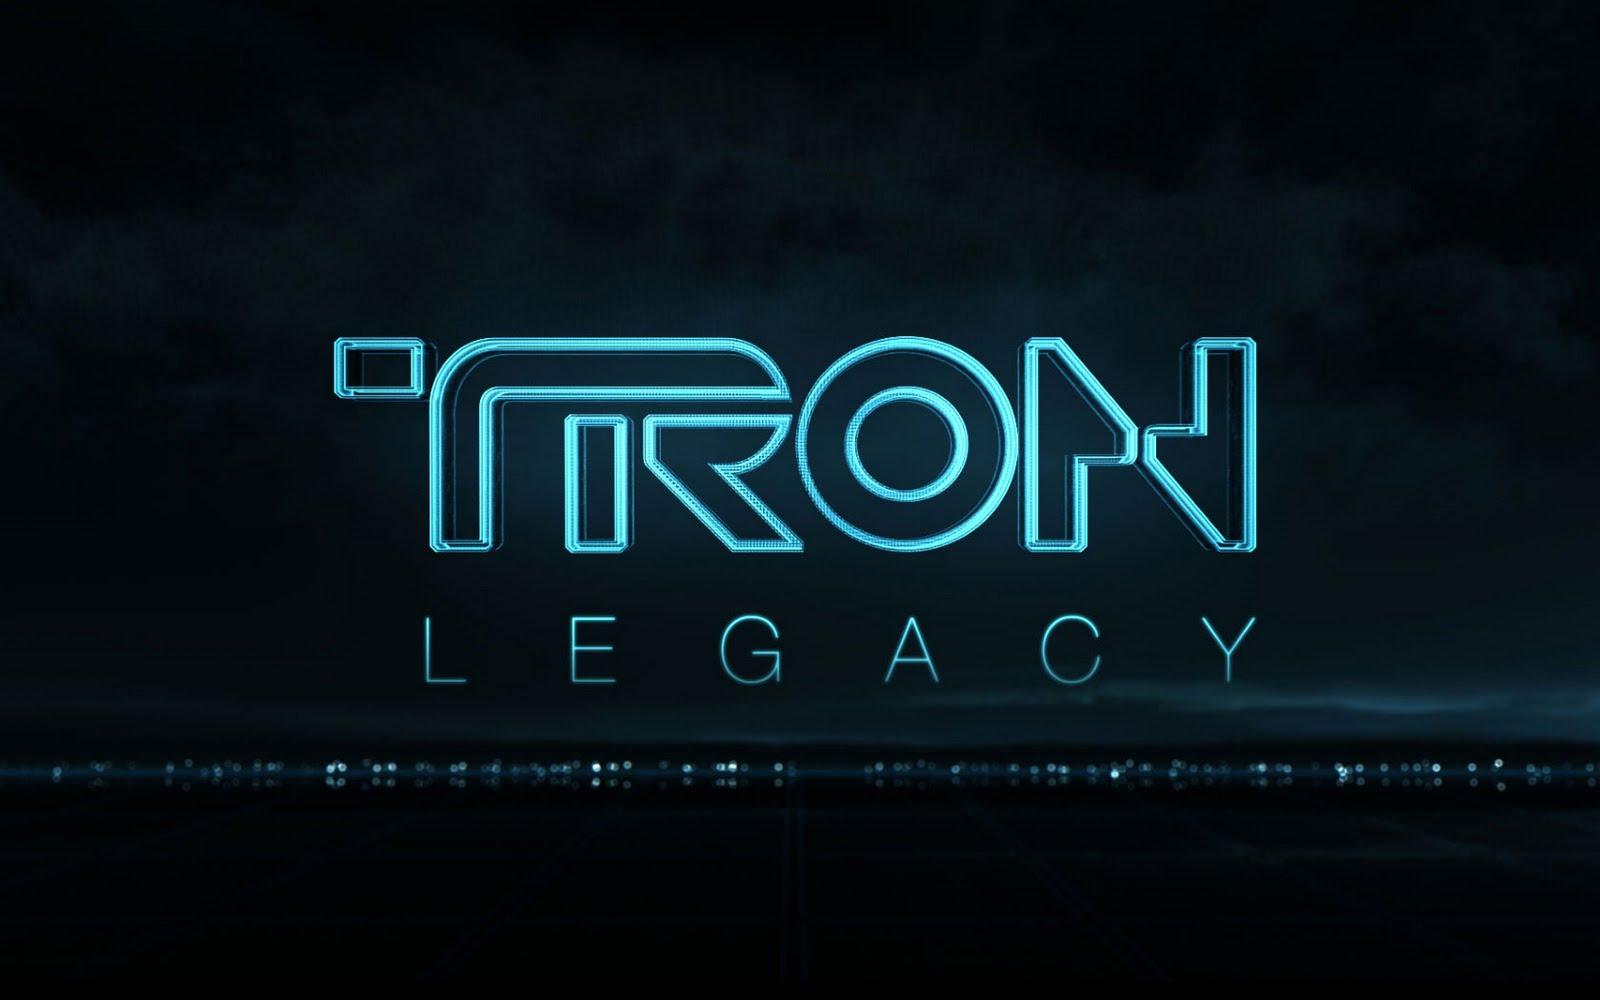 http://2.bp.blogspot.com/_Ain1HbvlMRk/TE4q6Rv0ZaI/AAAAAAAABJU/mOvbXomf9SU/s1600/wallpaper-tron+legacy1.jpg